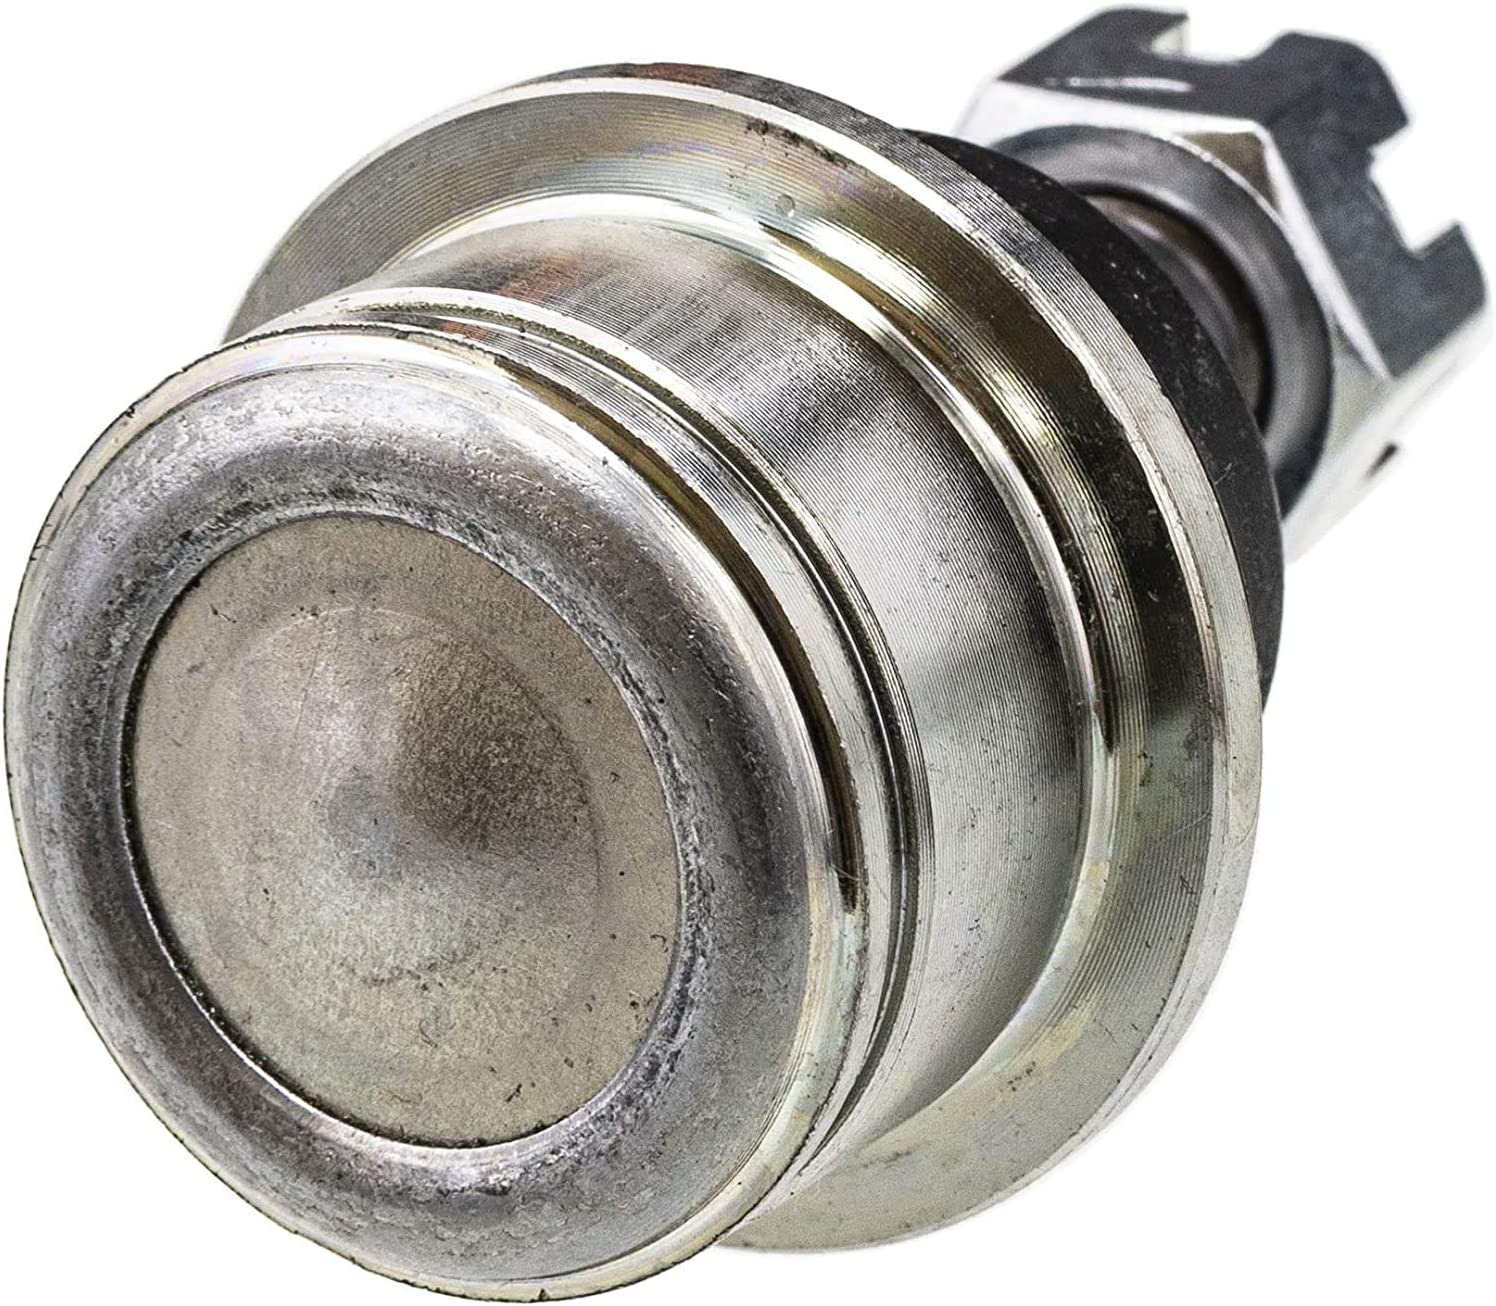 Ball Joint Compatible With Honda 51375-HP5-601 Foreman 450 500 TRX500FPM TRX500FE TRX500FPE TRX500FM Upper Lower 4 Pack